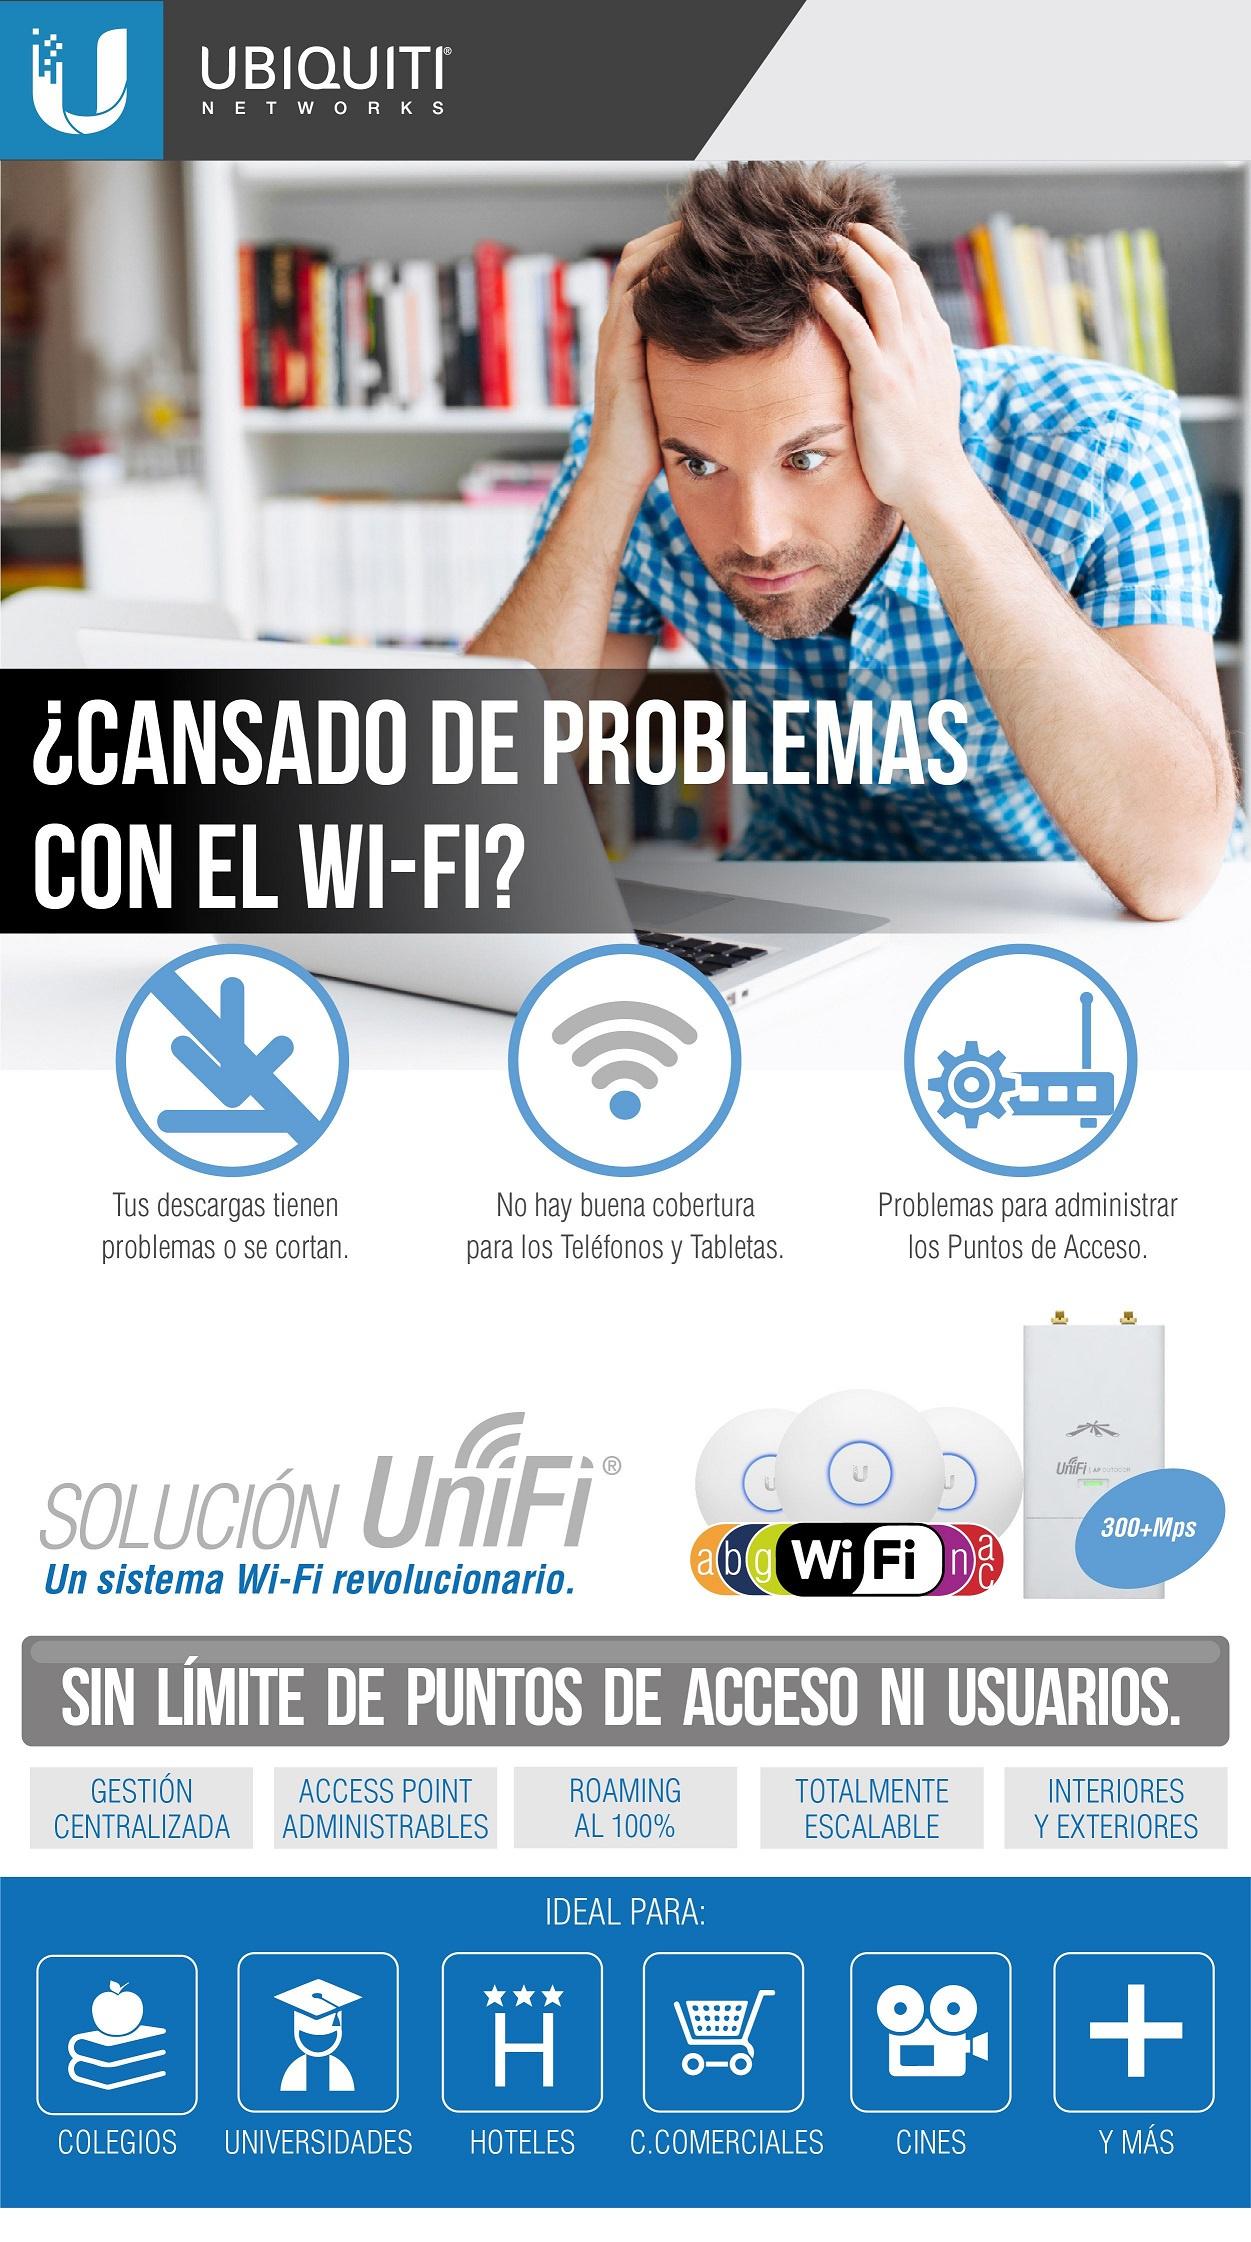 https://0201.nccdn.net/1_2/000/000/130/223/PROBLEMAS-CON-EL-WIFI-1251x2242.jpg